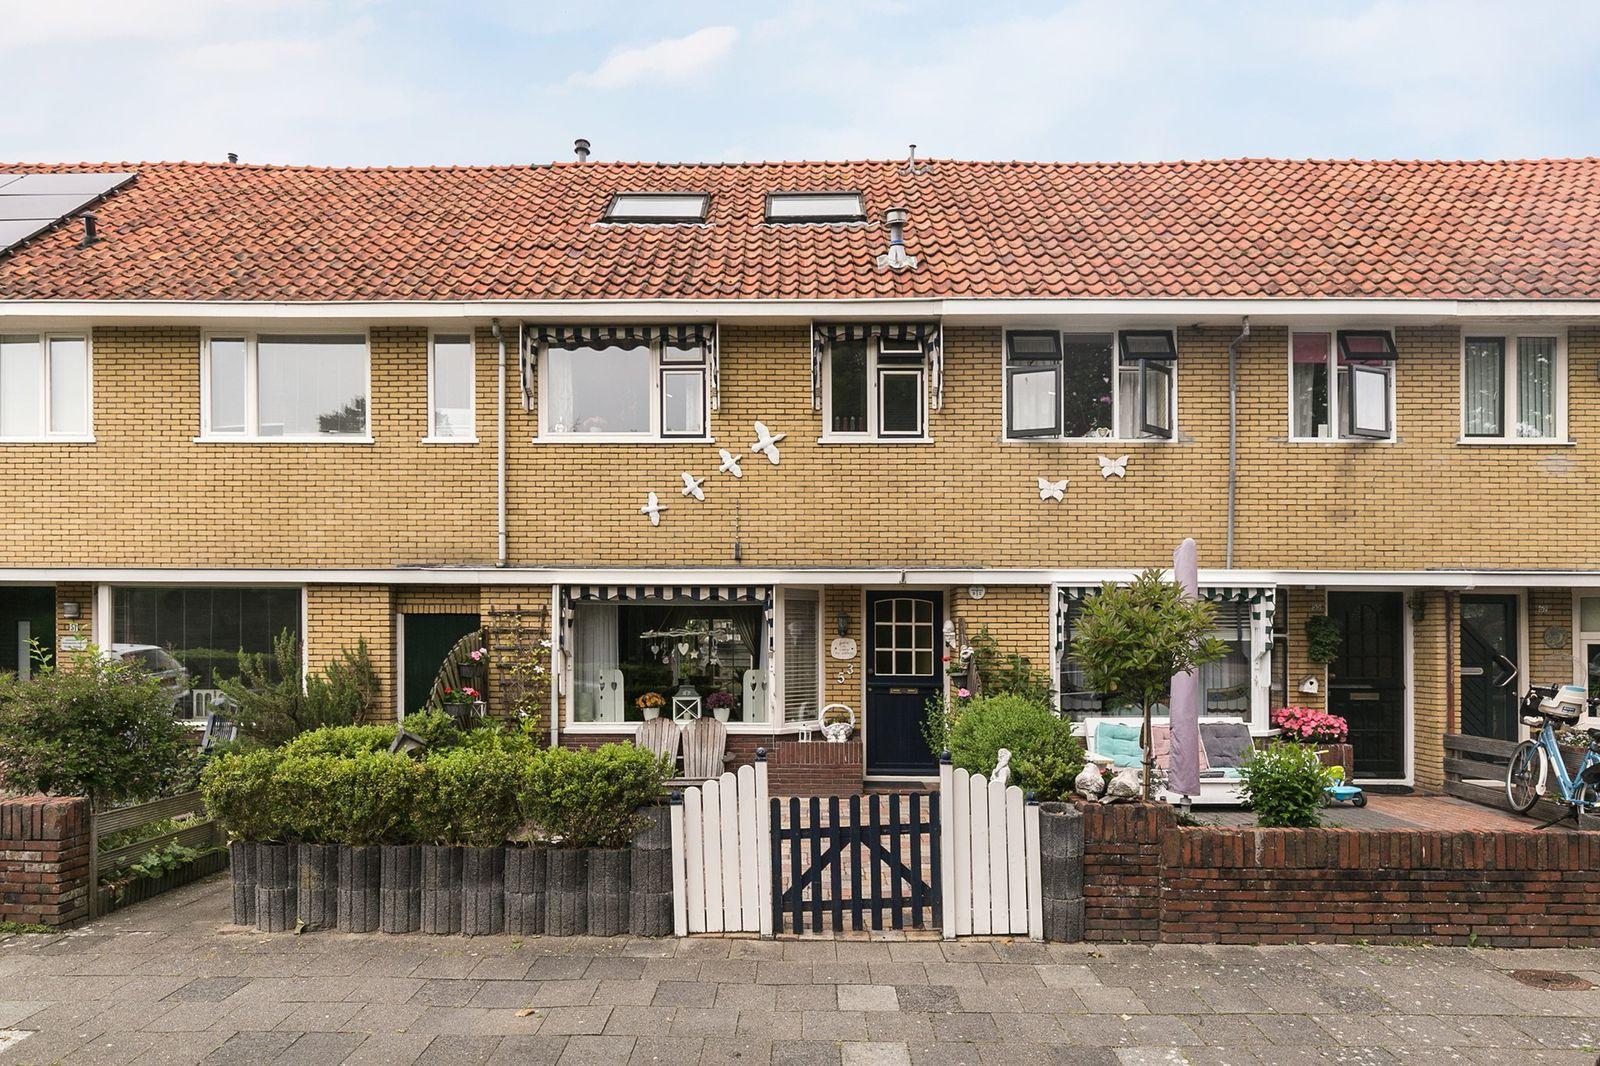 Swammerdamstraat 53, Leeuwarden